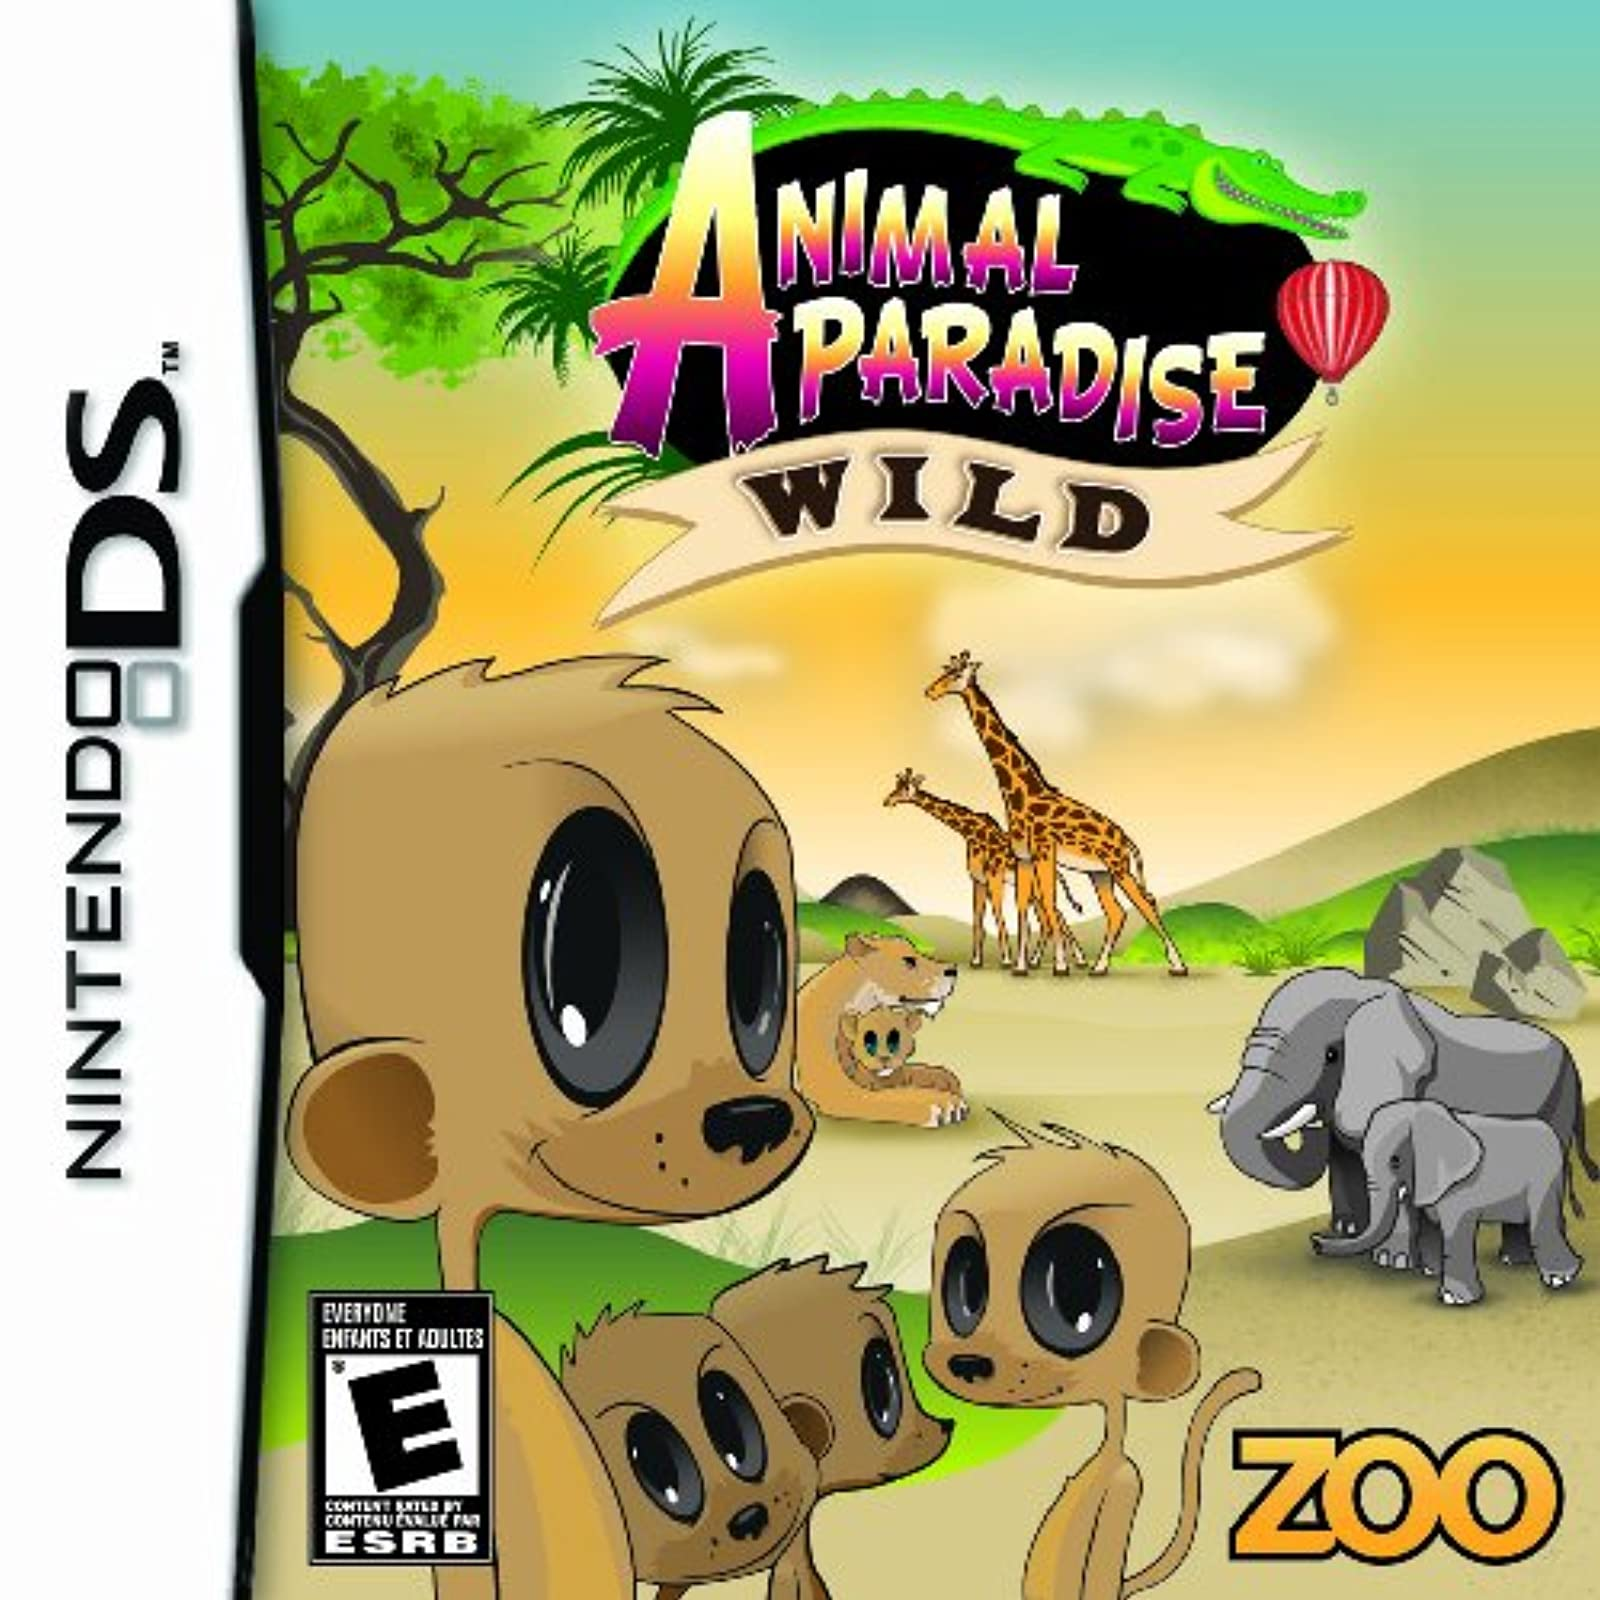 Animal Paradise Wild For Nintendo DS DSi 3DS